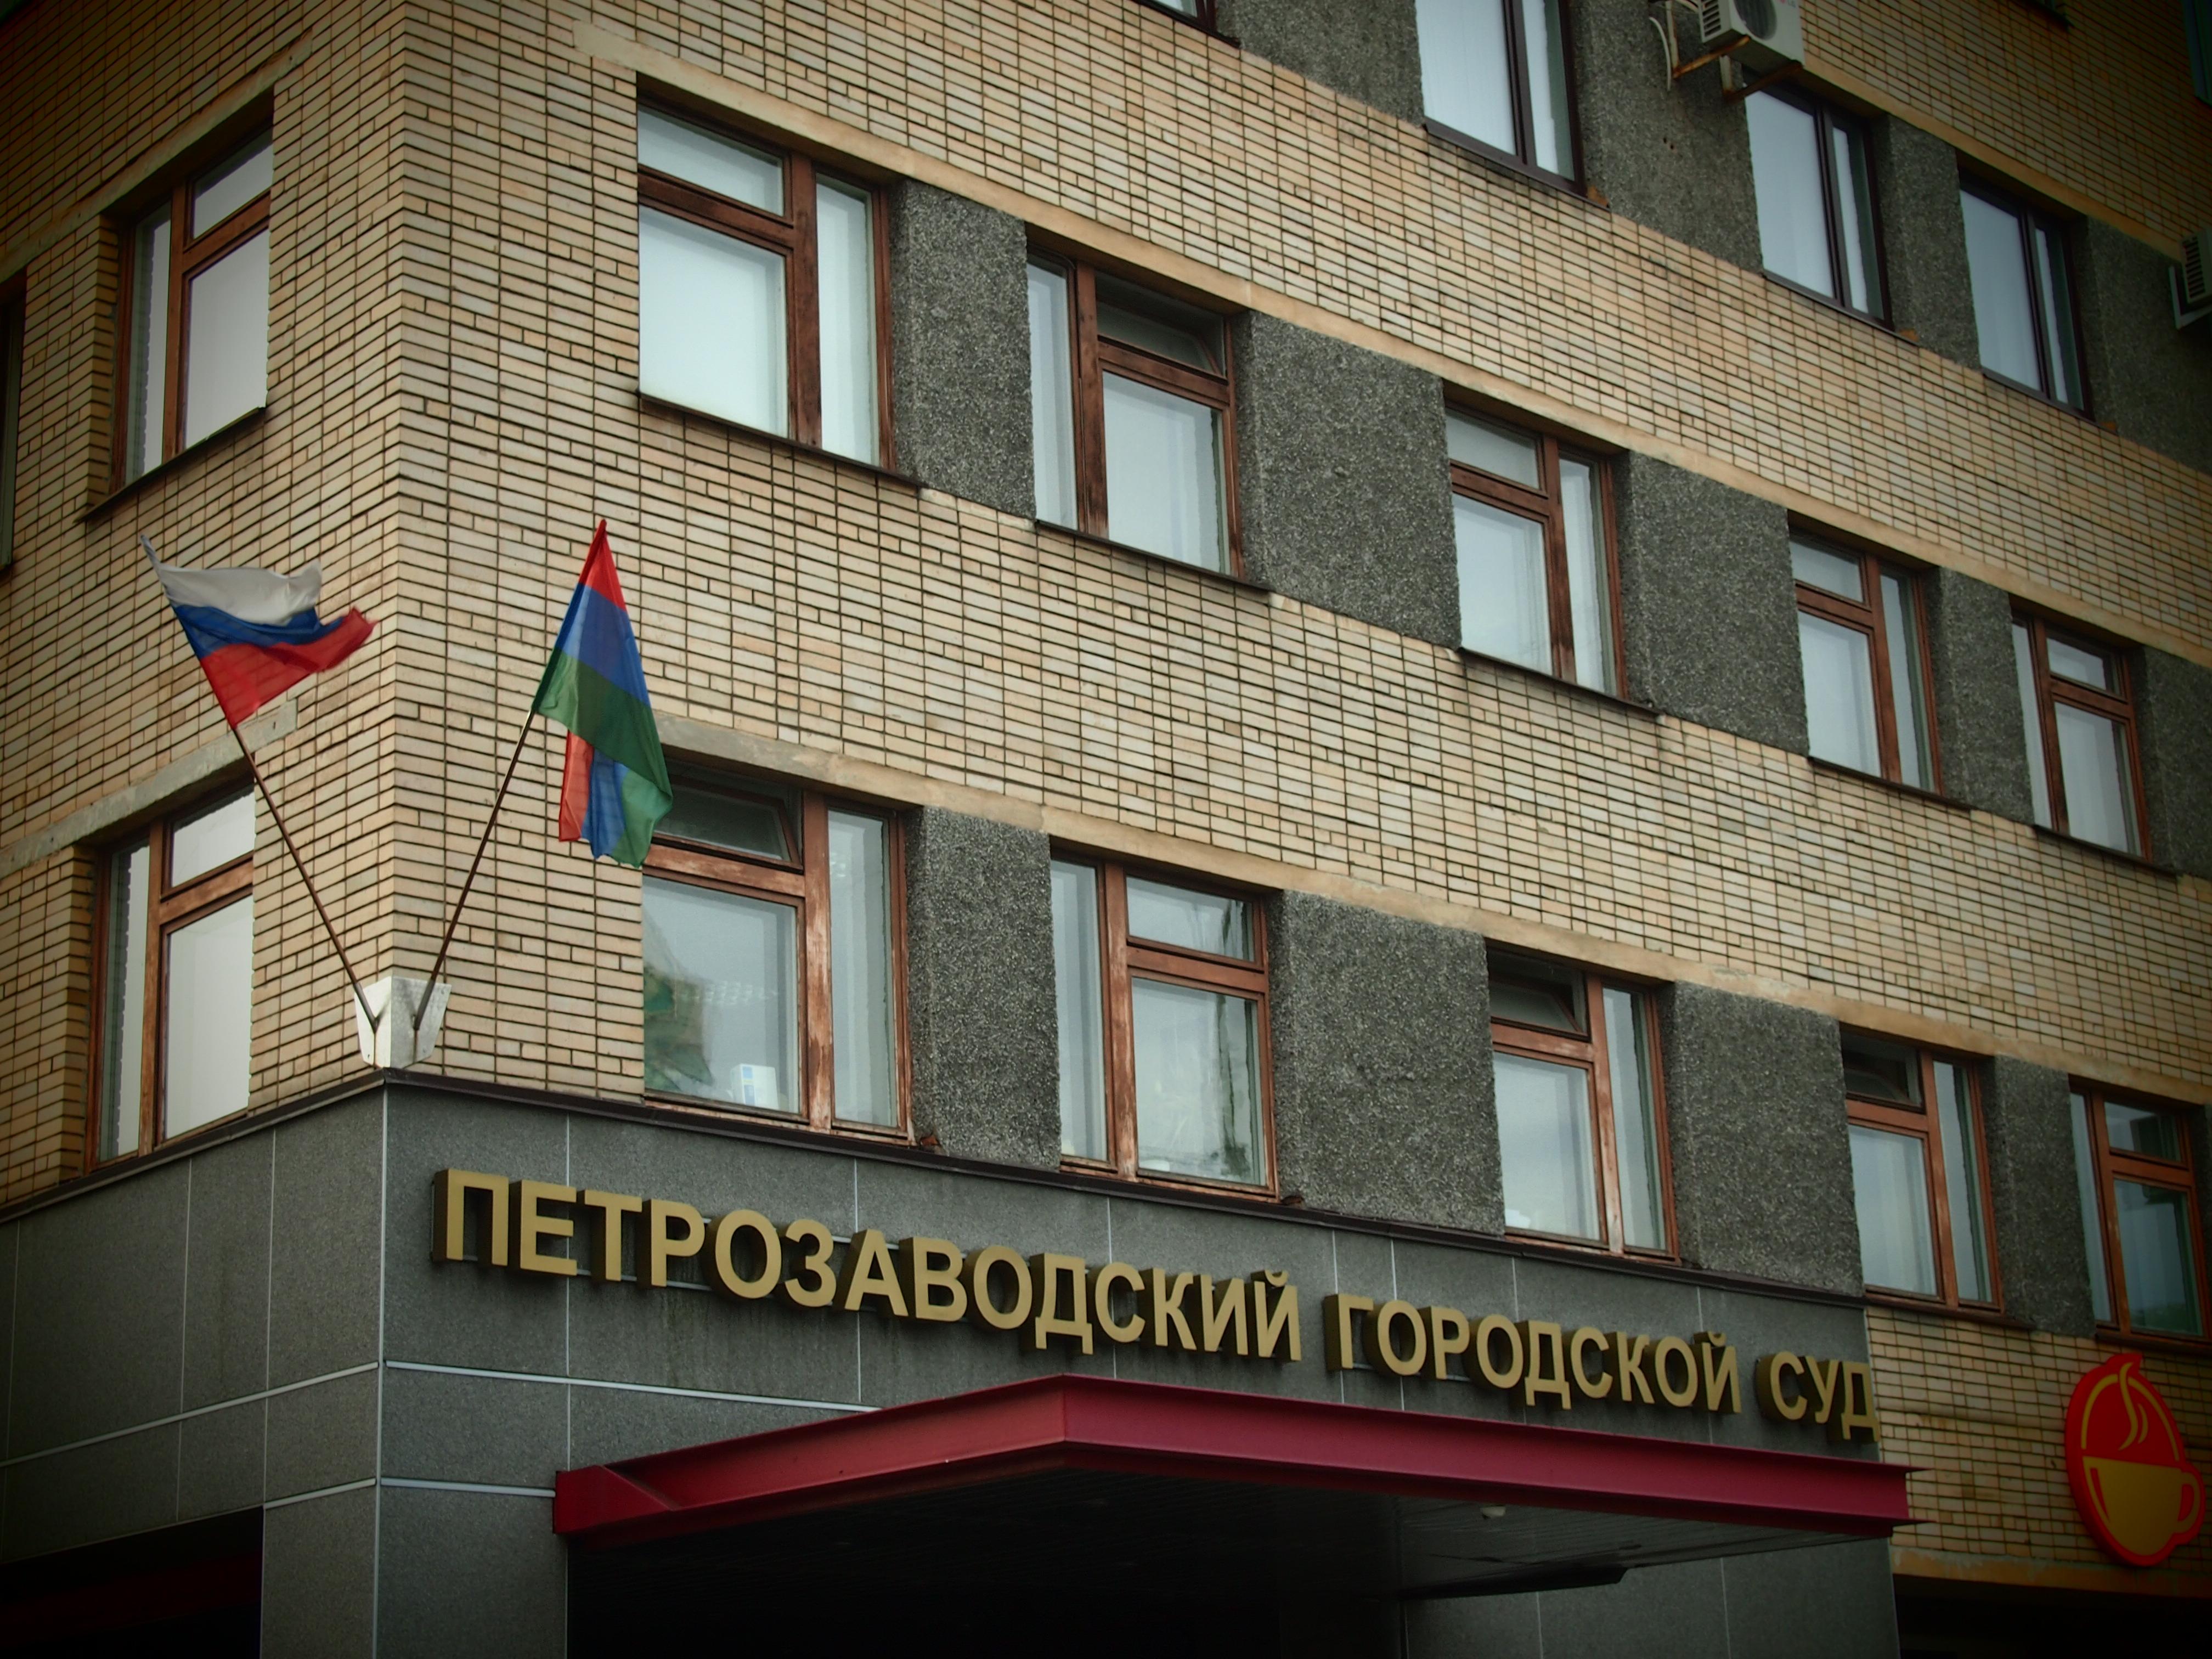 Петрозаводский городский суд. Фото: Валерий Поташов